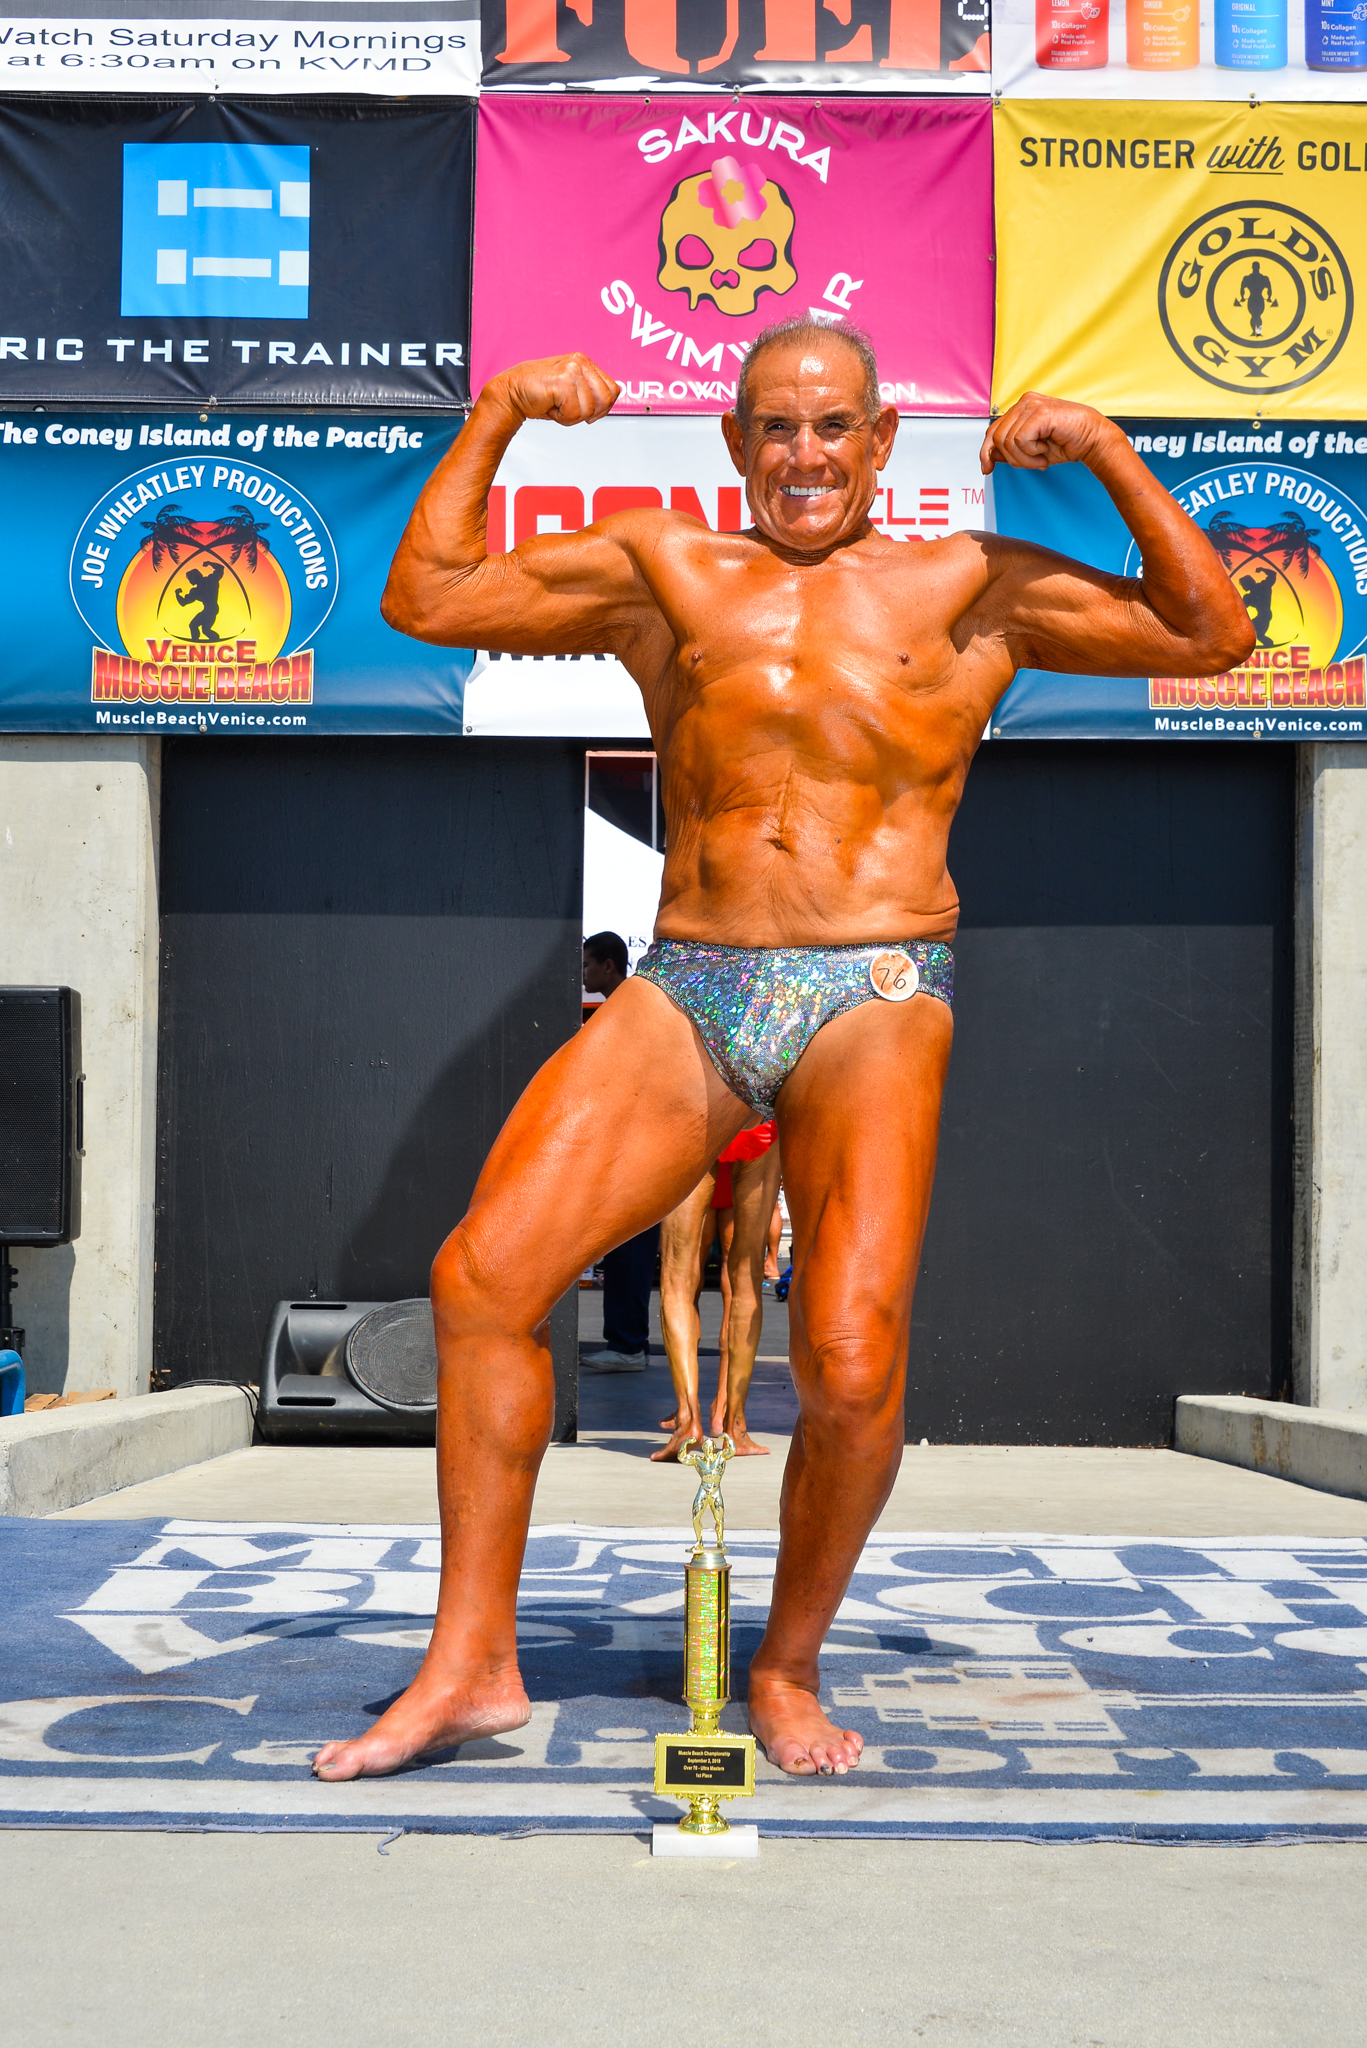 Ed Urbano Bodybuilder